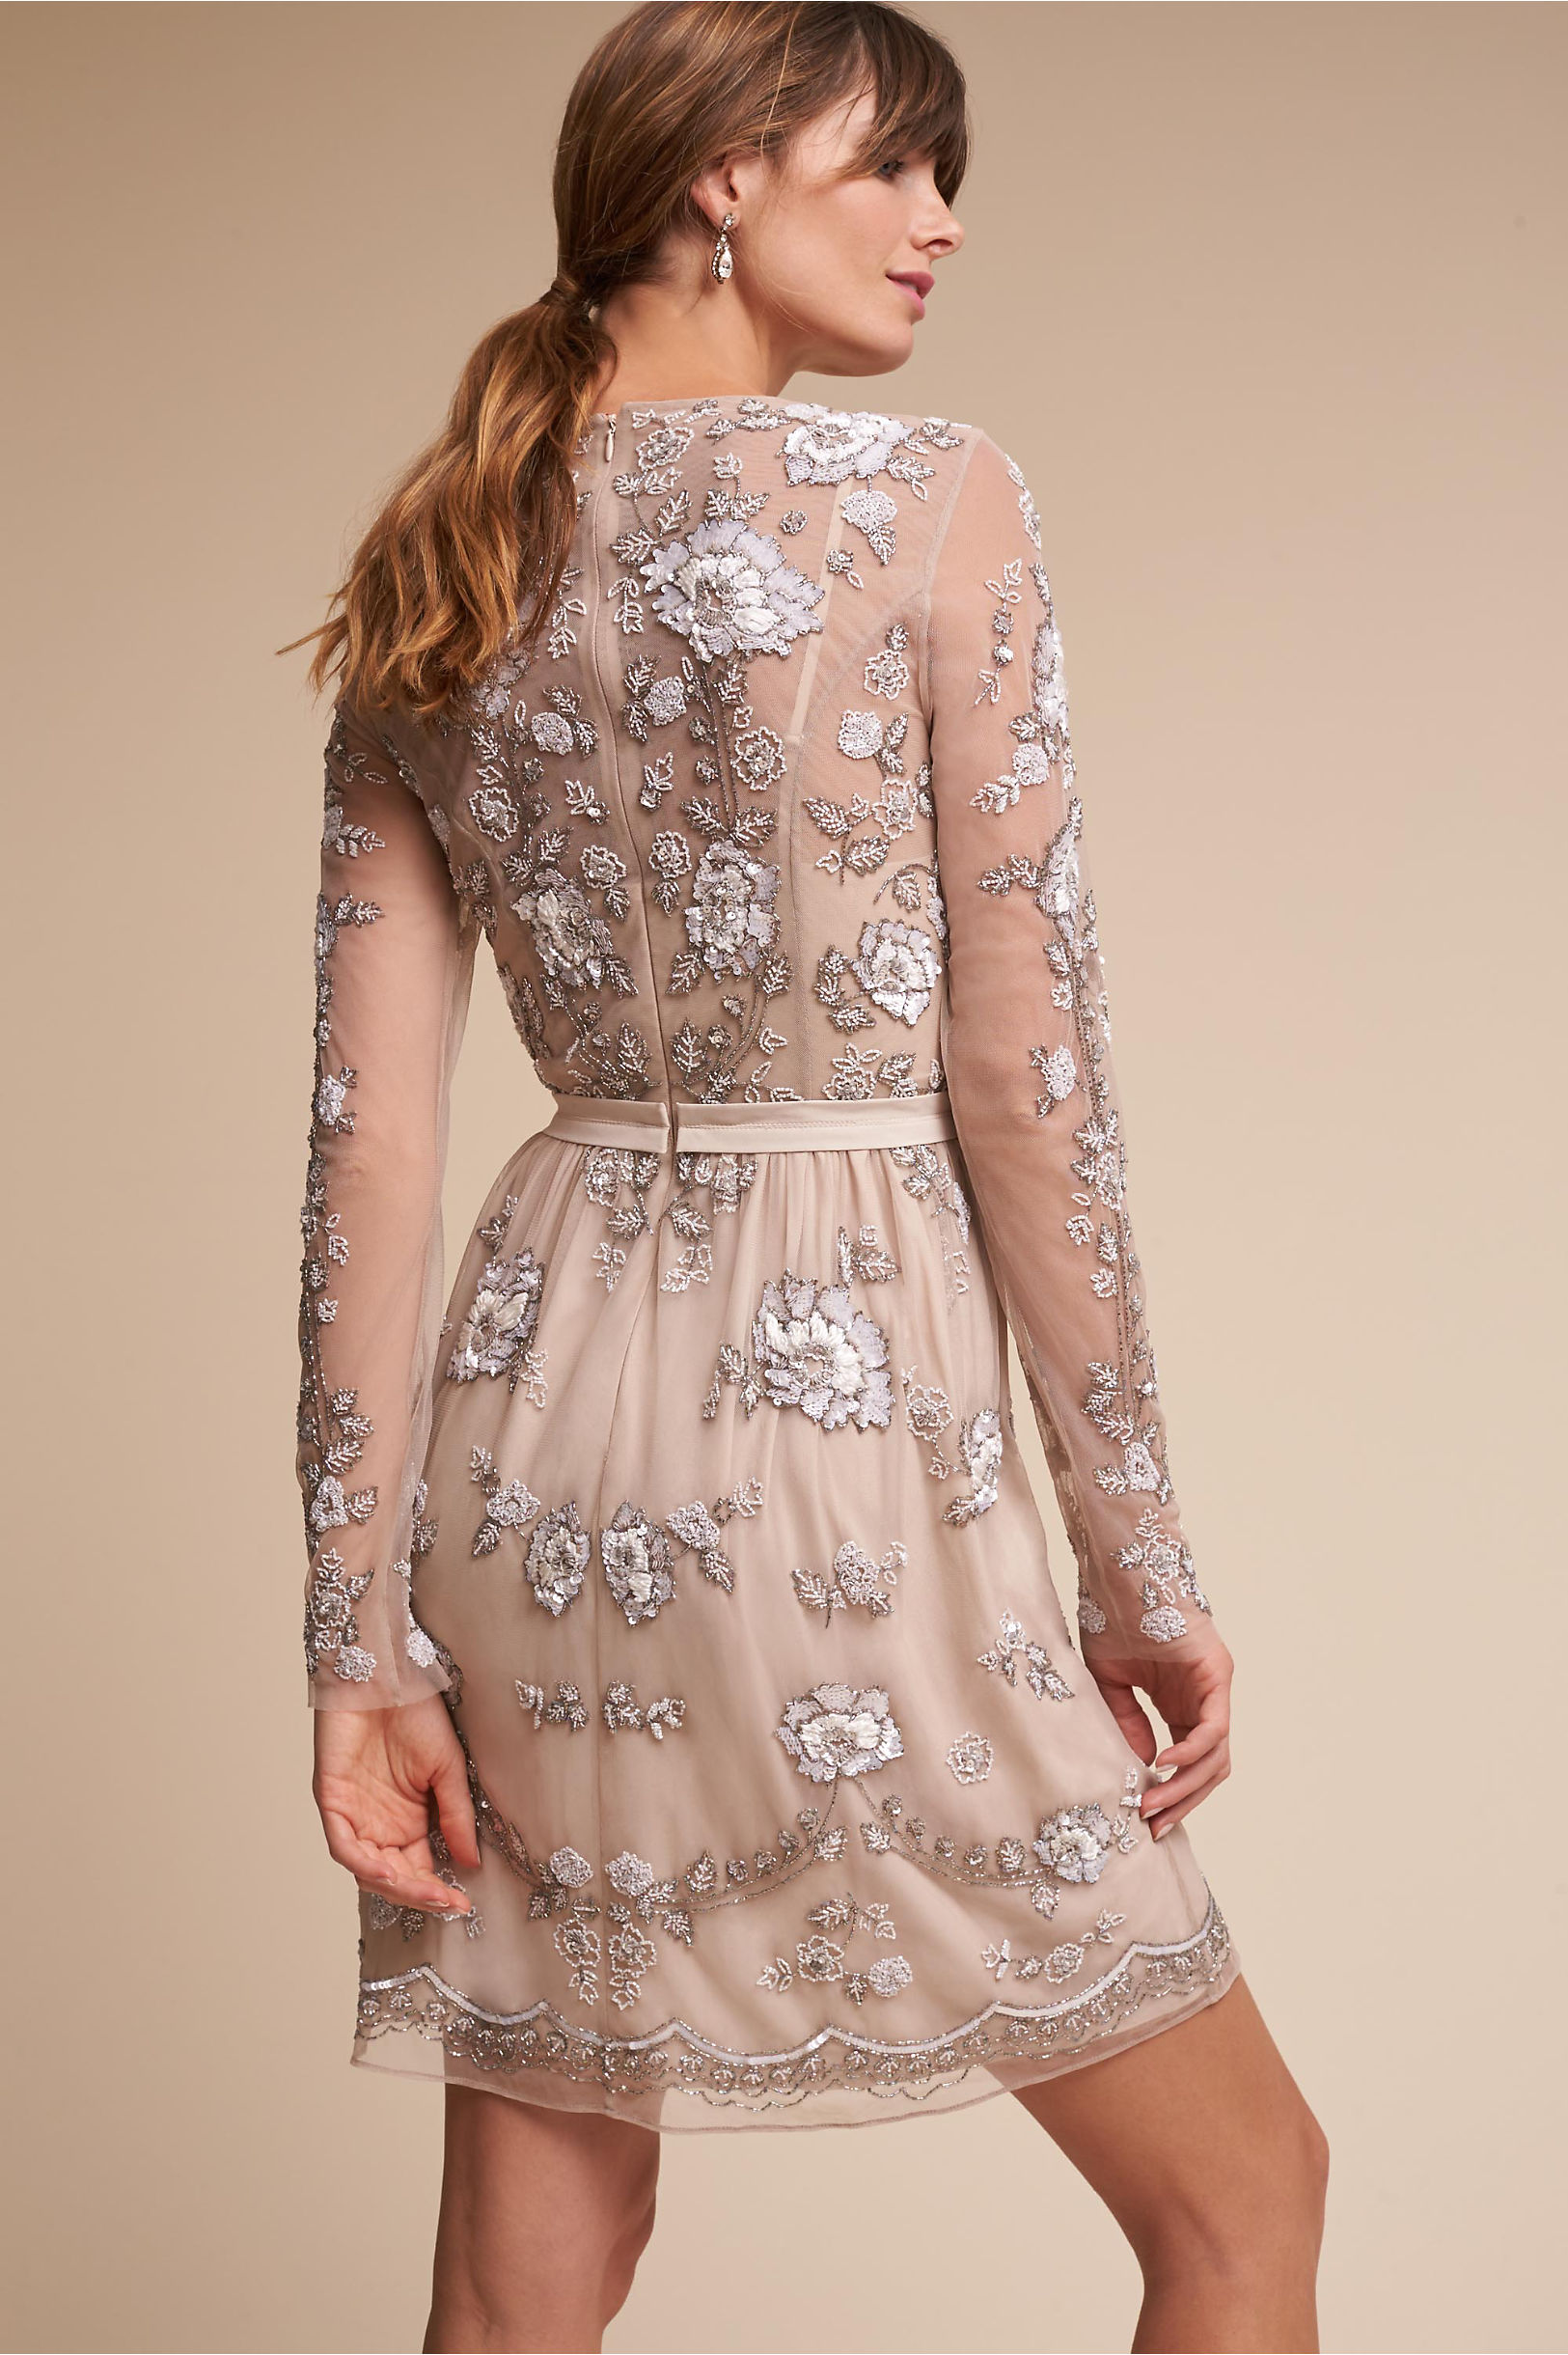 Malia Dress Taupe in Sale   BHLDN